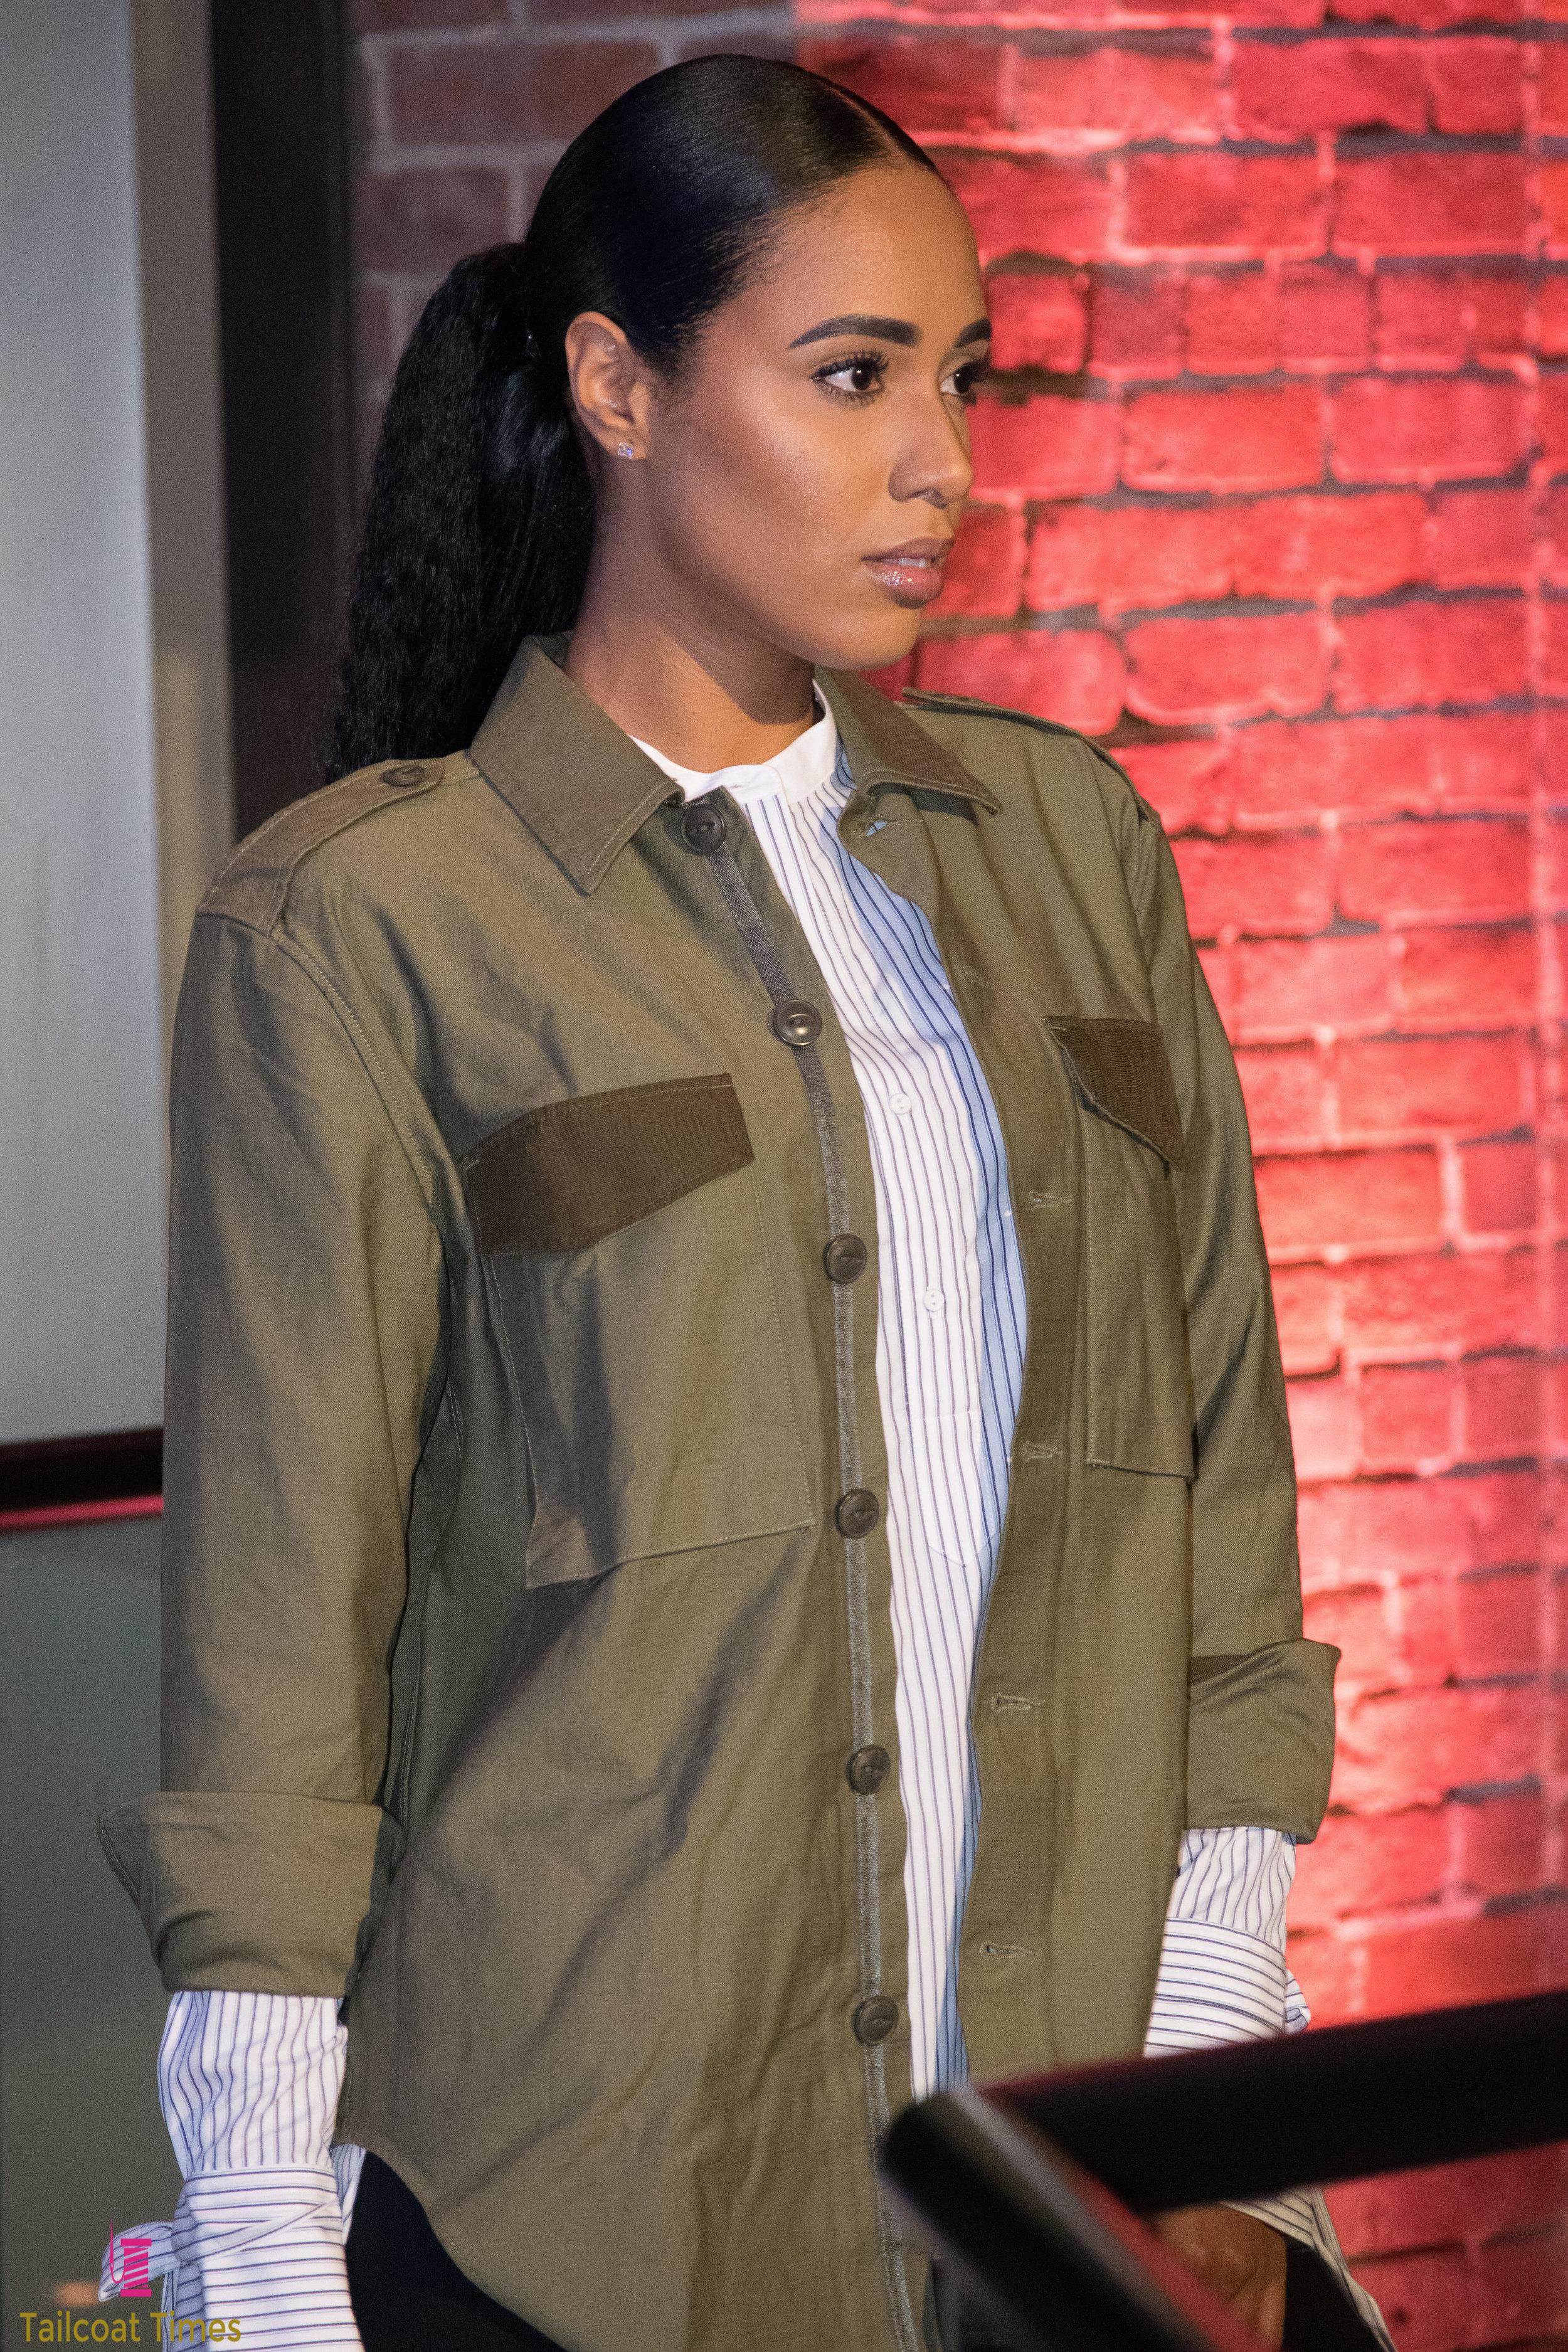 FashionablyLate_TrunkShow_Tailcoat Times (41 of 48).jpg